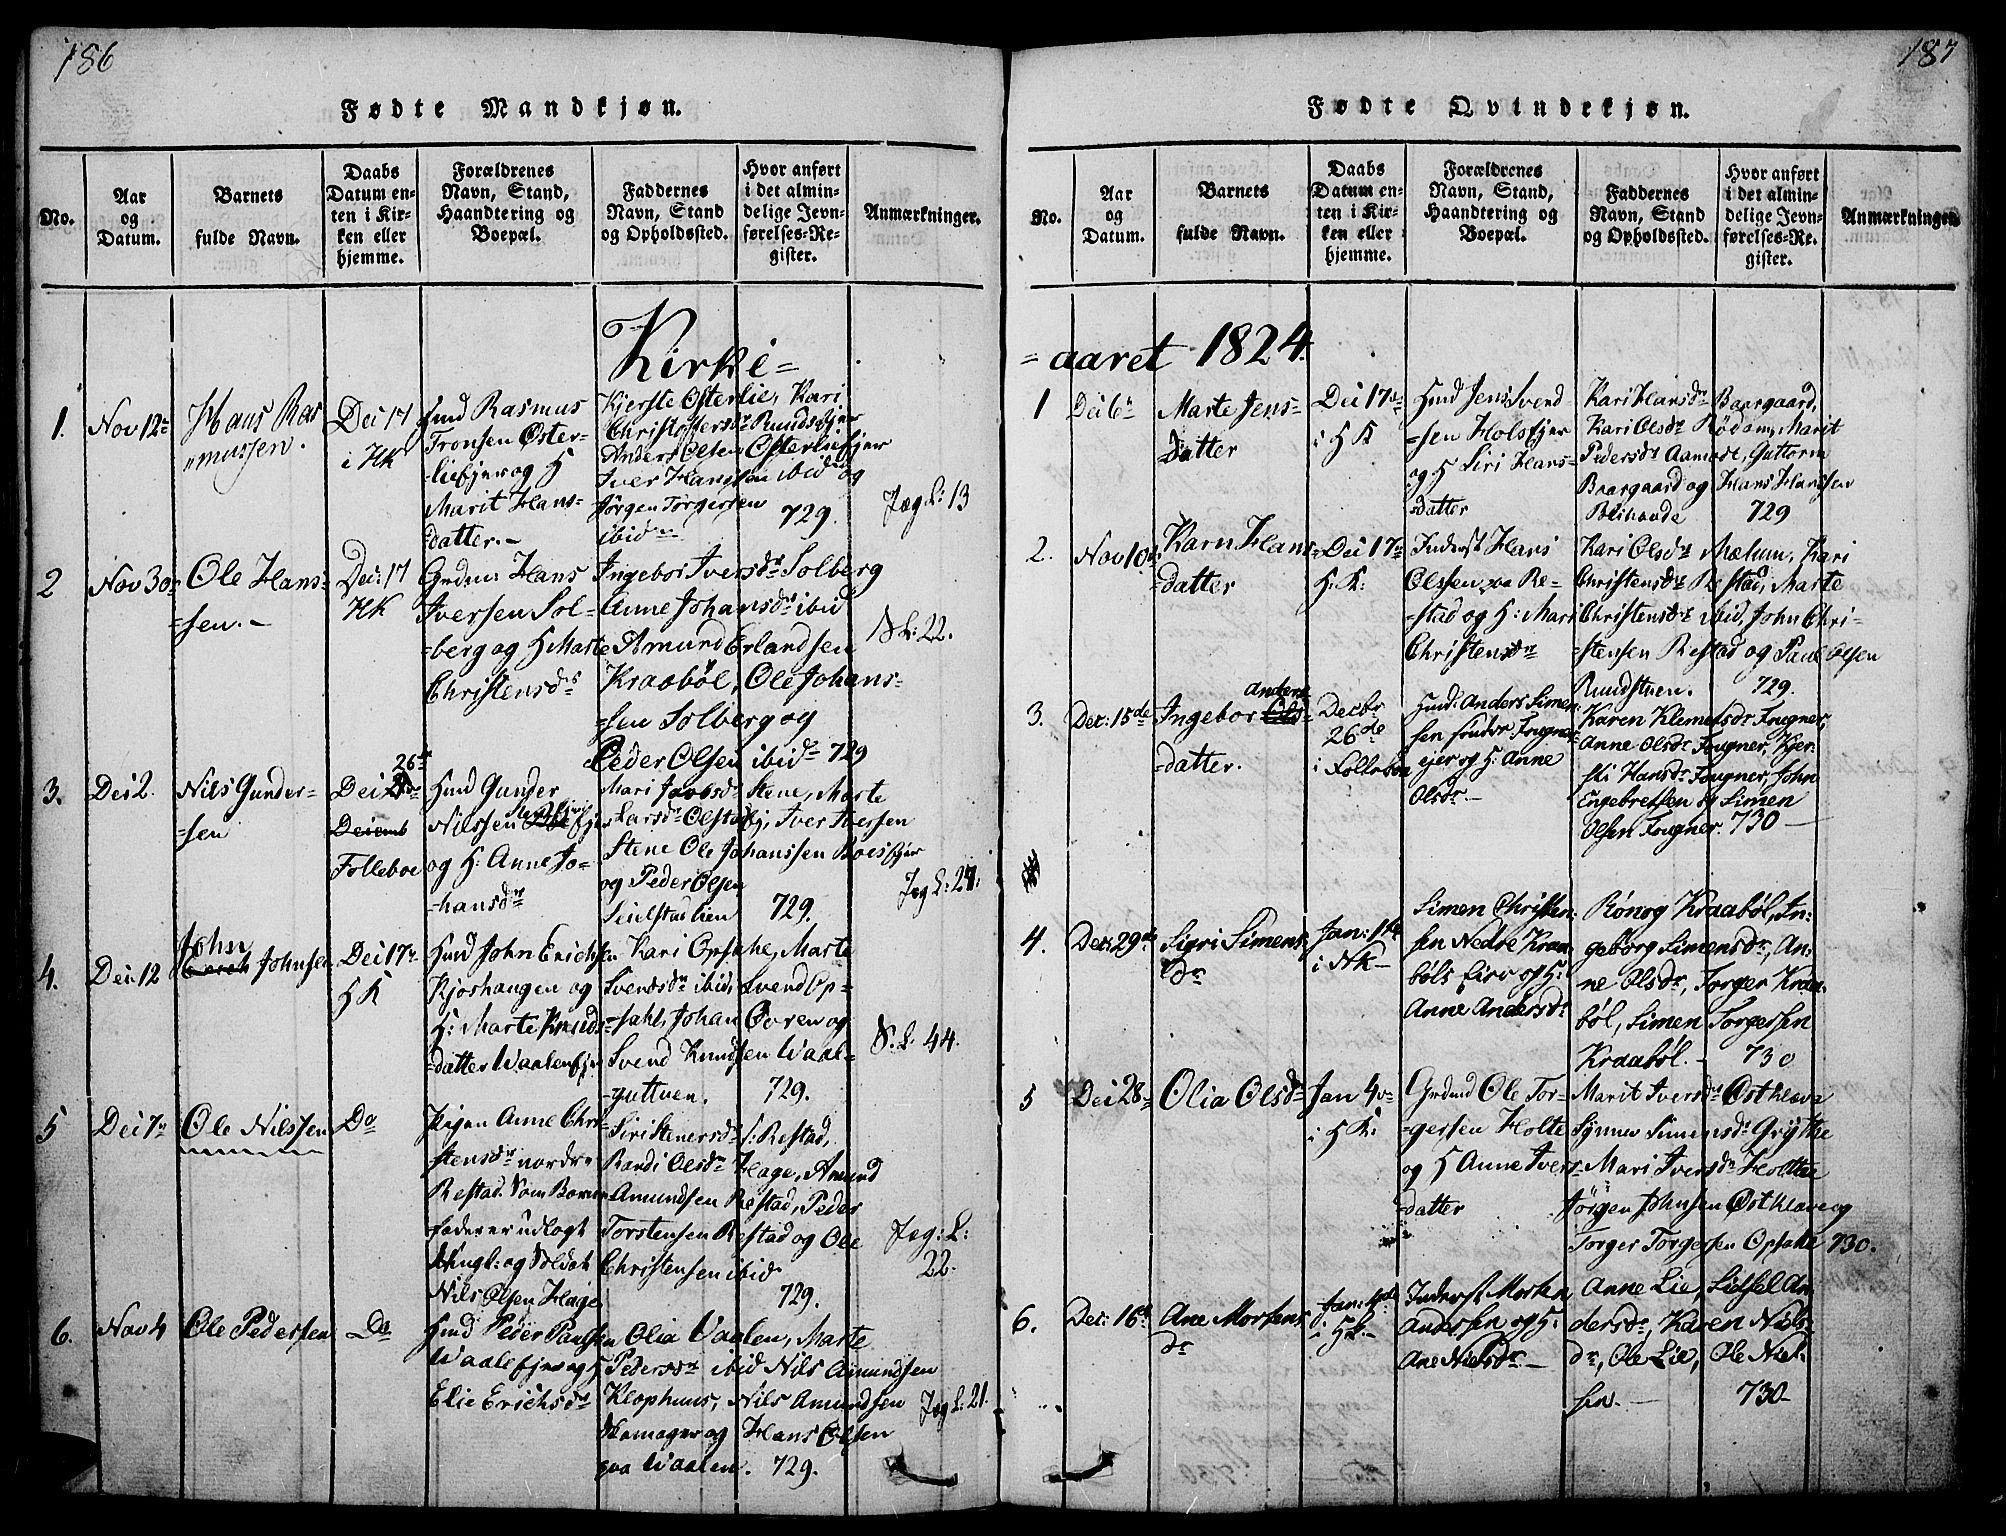 SAH, Gausdal prestekontor, Ministerialbok nr. 5, 1817-1829, s. 186-187